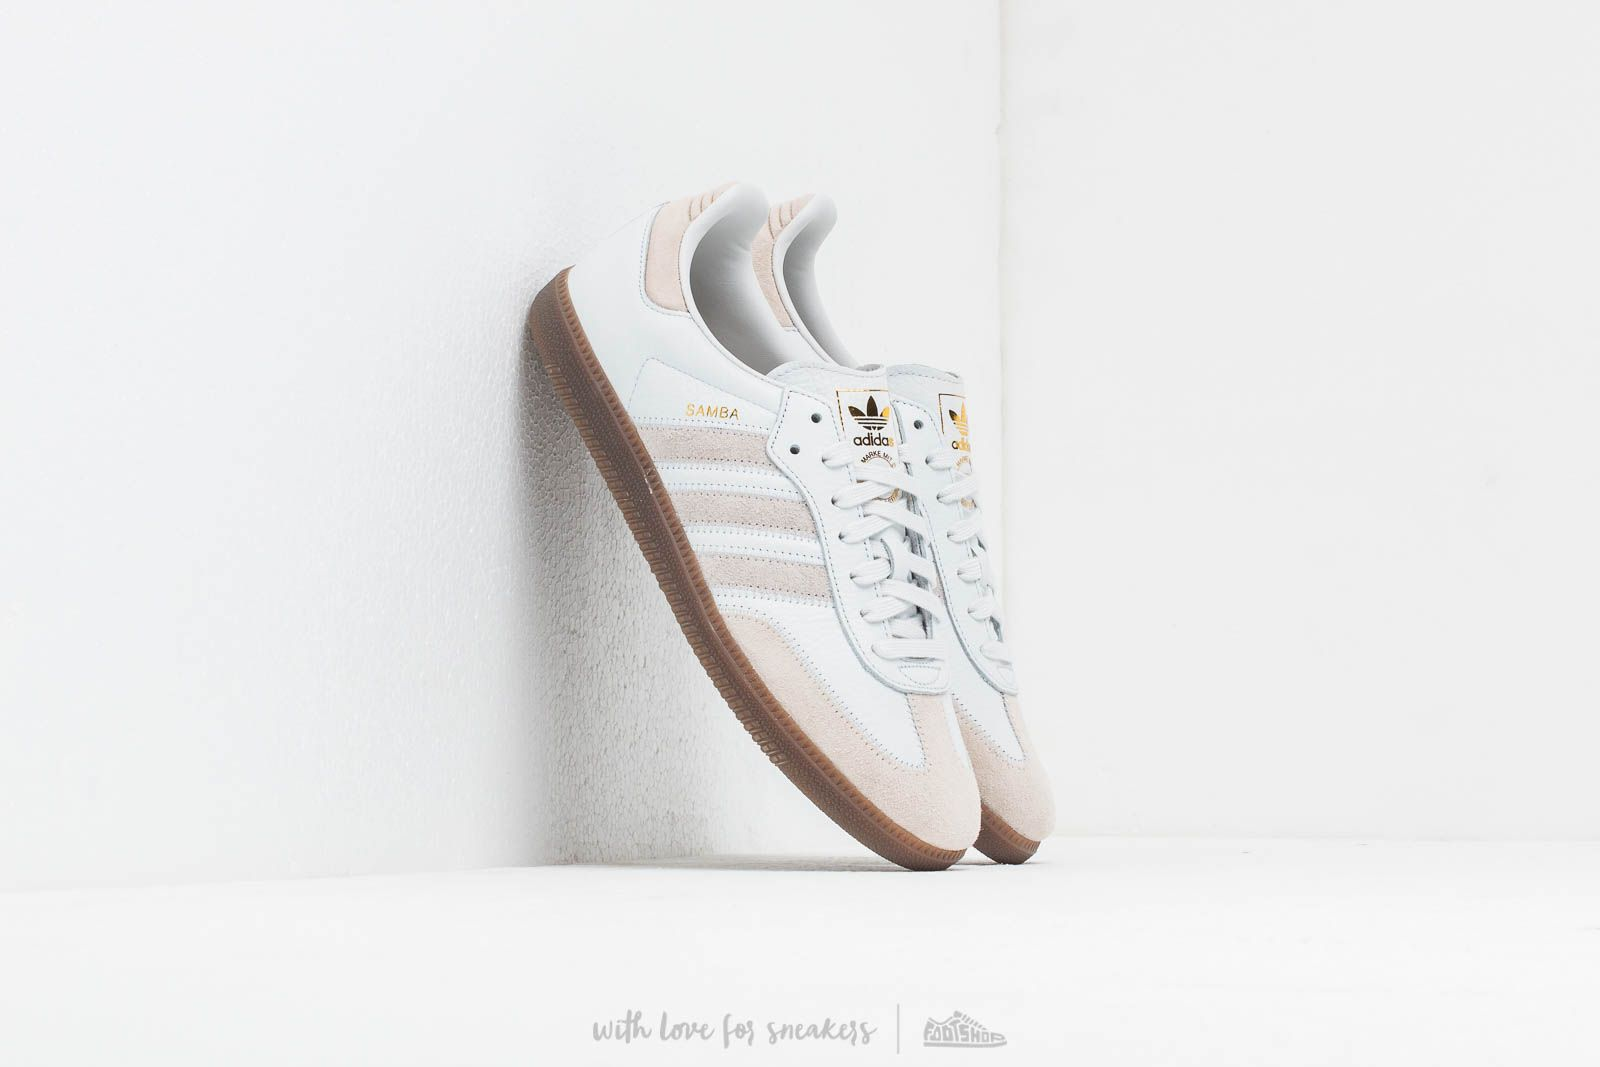 adidas samba og schuh oder adidas samba